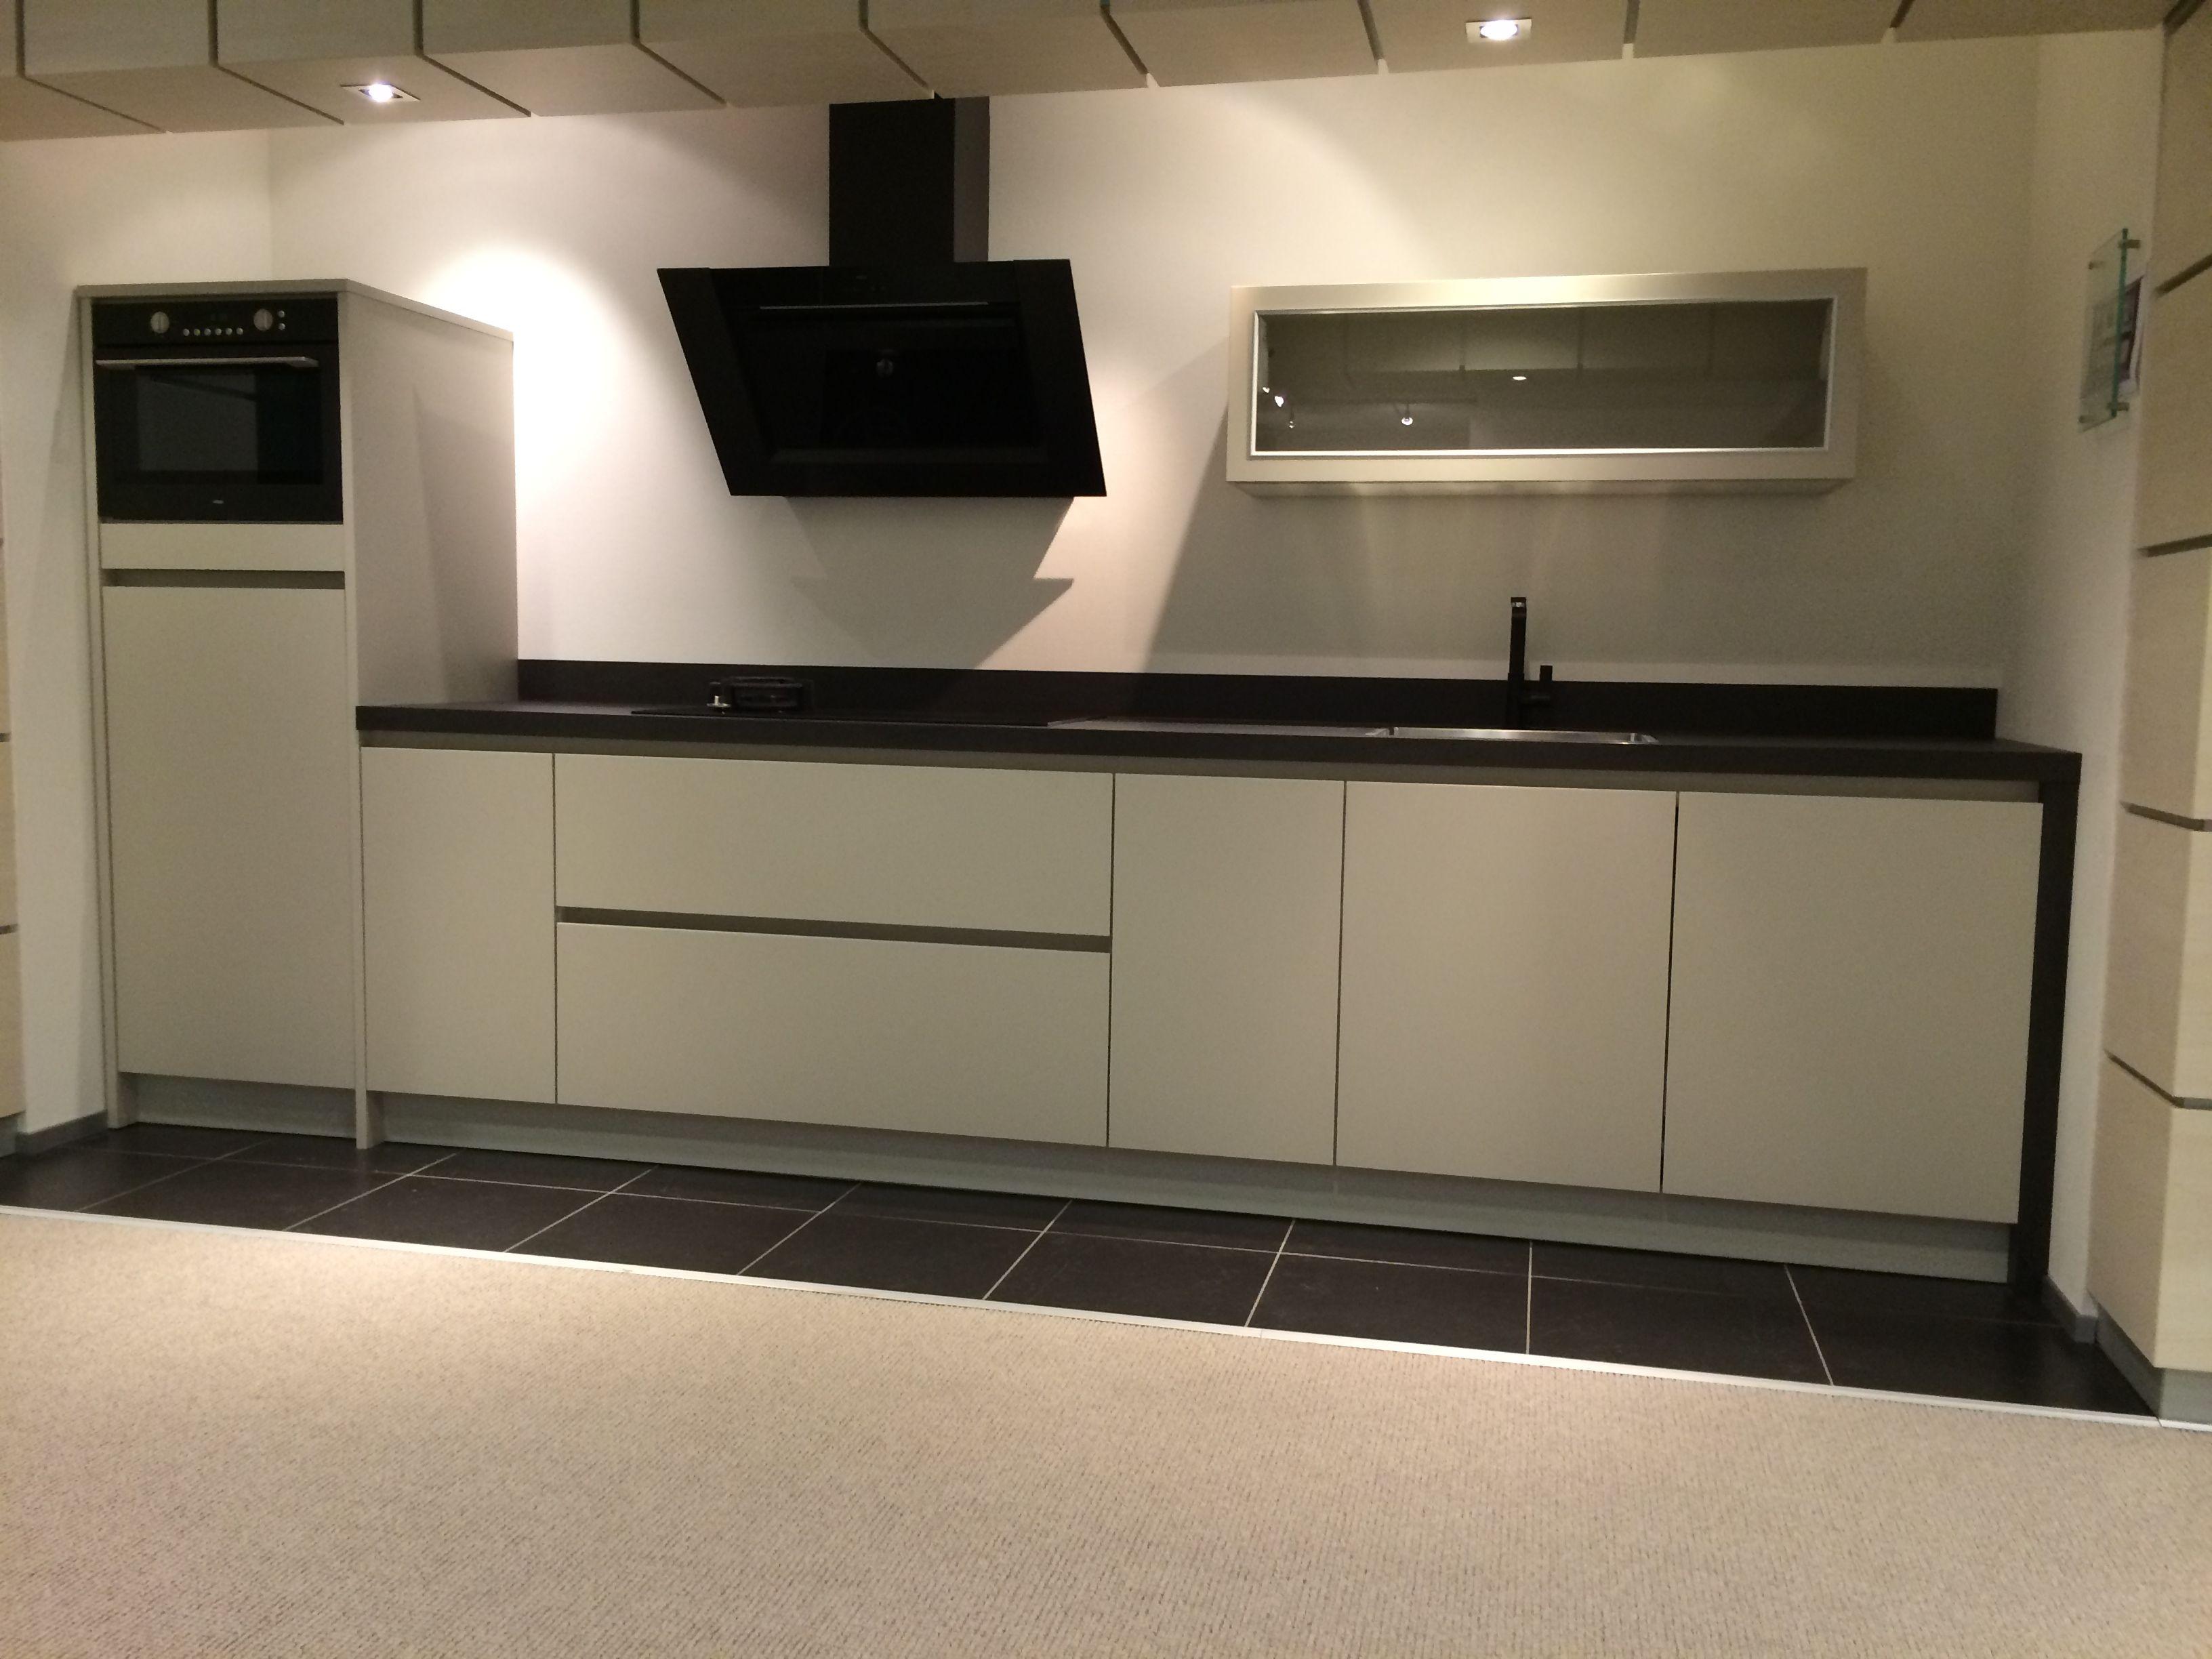 Keller gl xtra moderne greeploze keuken in zandbeige volledig